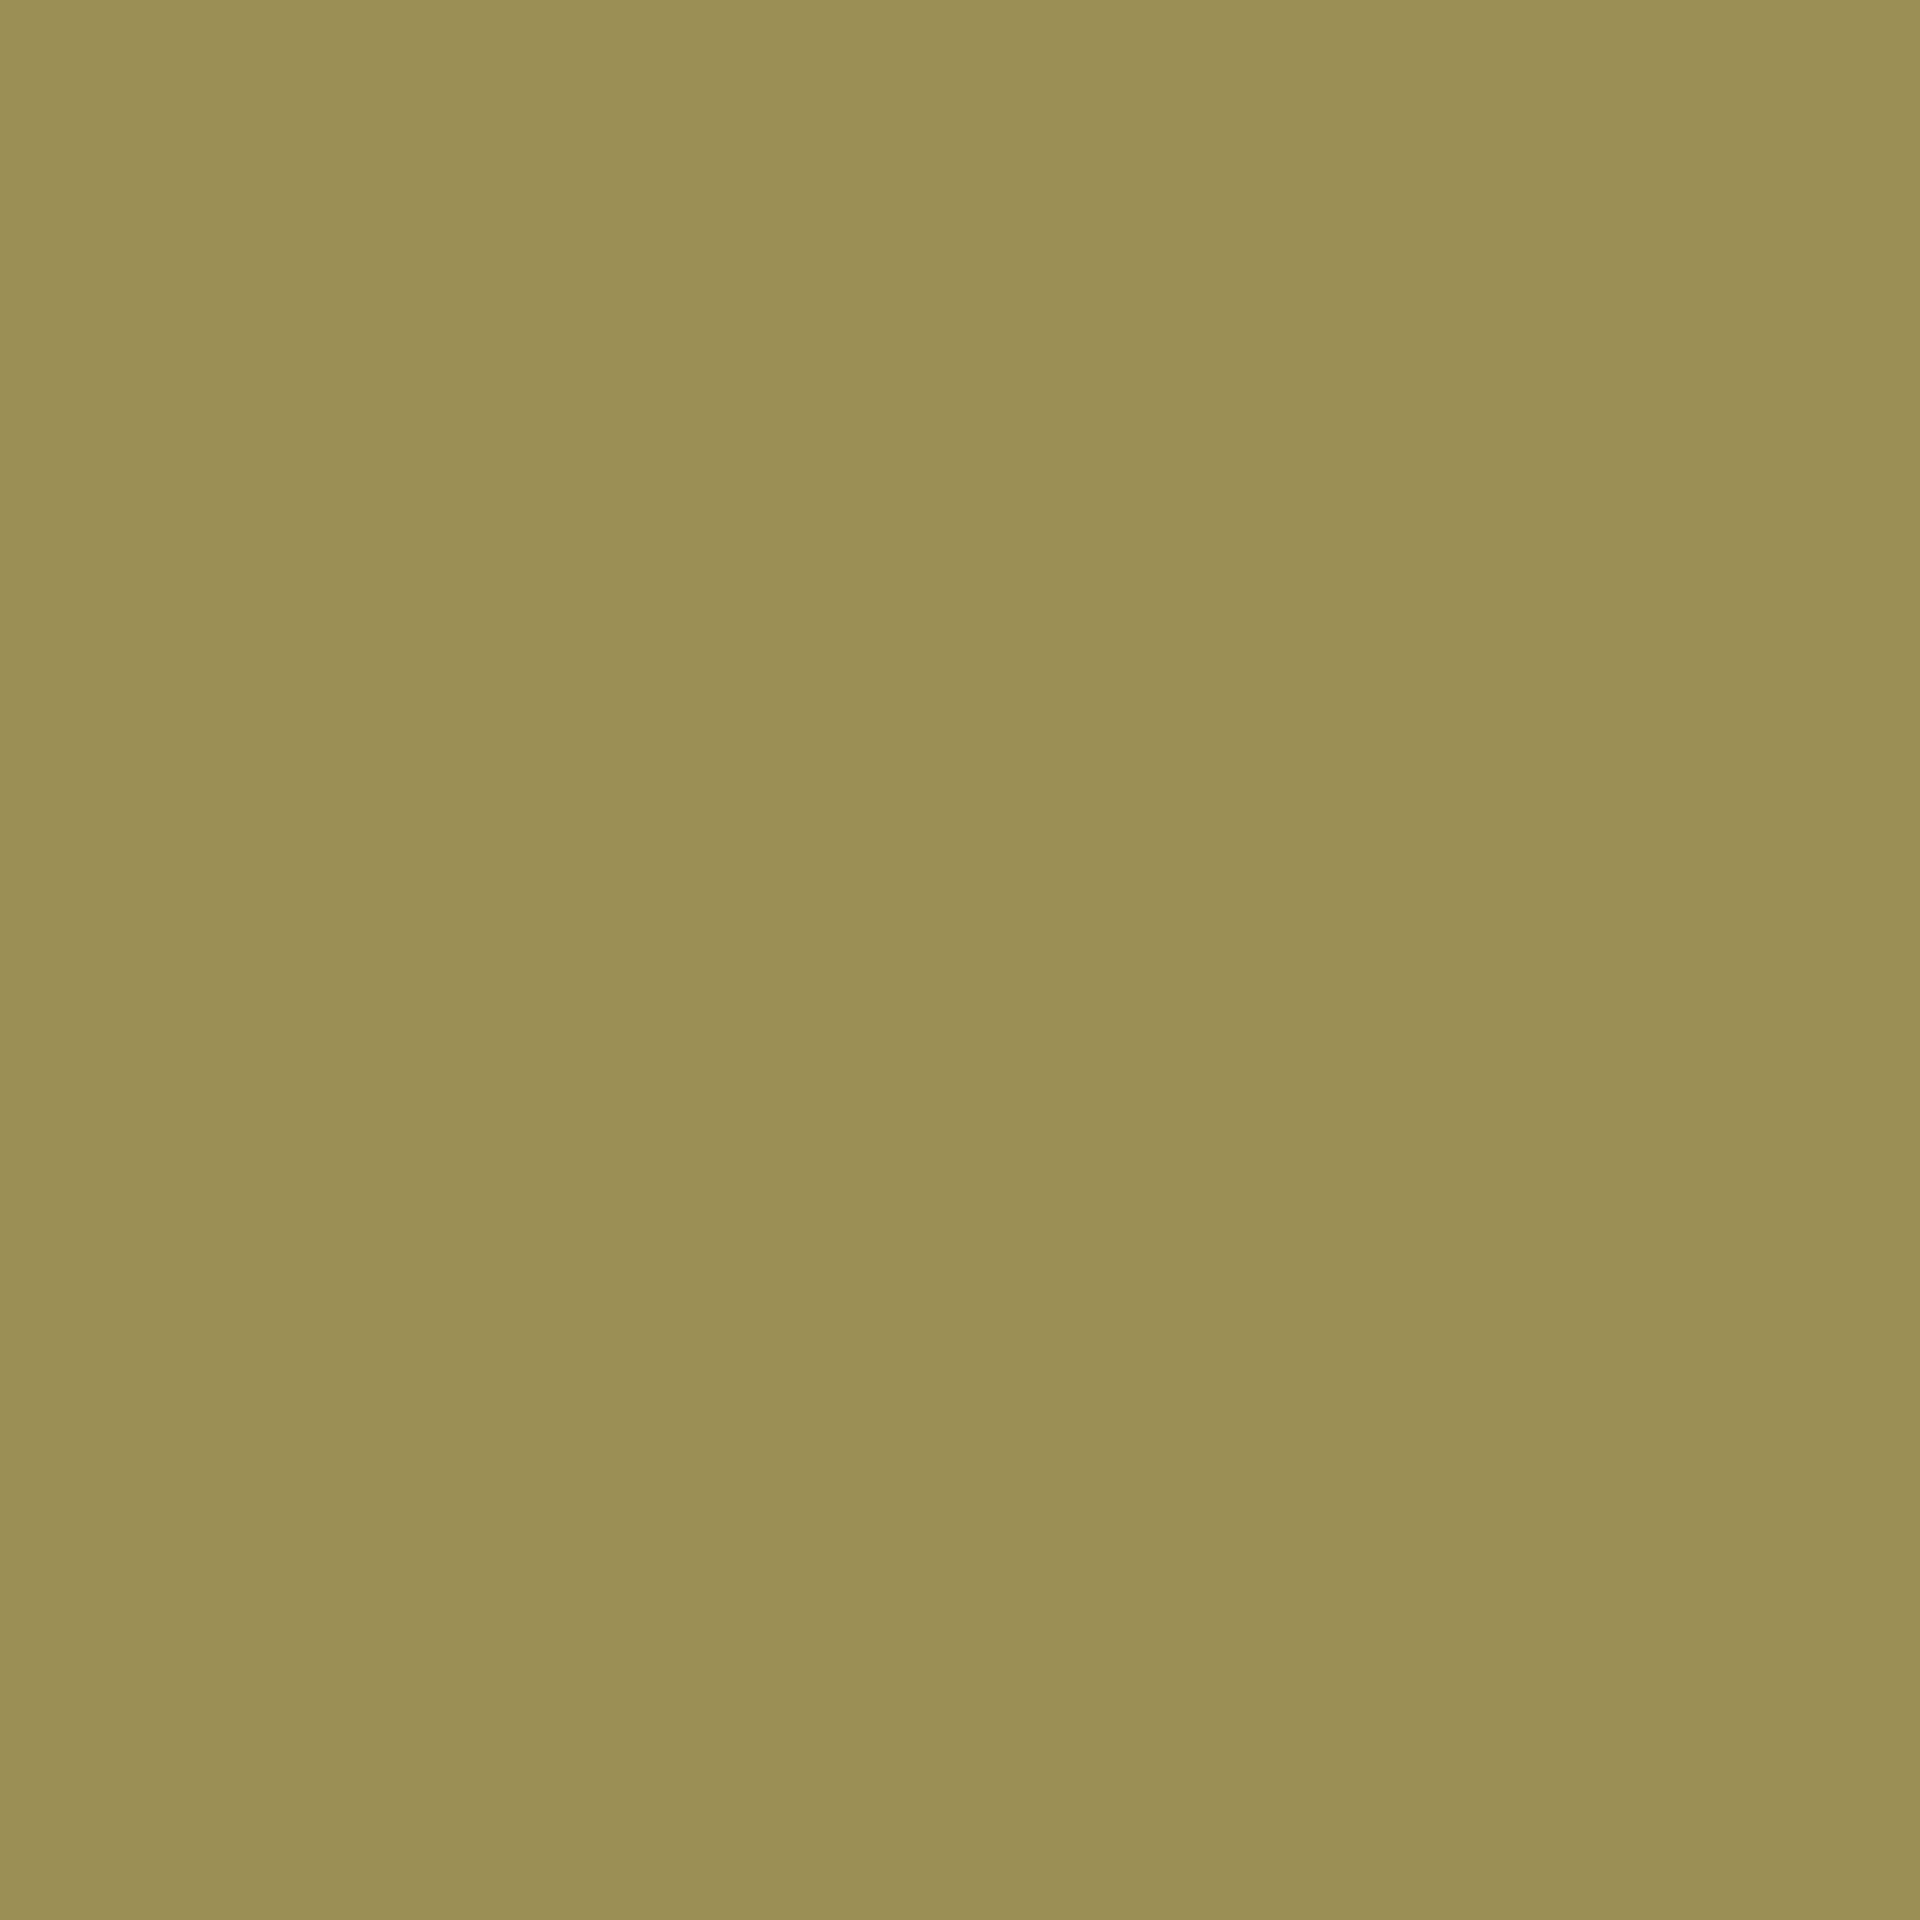 wallpaper,dark,khaki,color,background,plain,simple,dark khaki